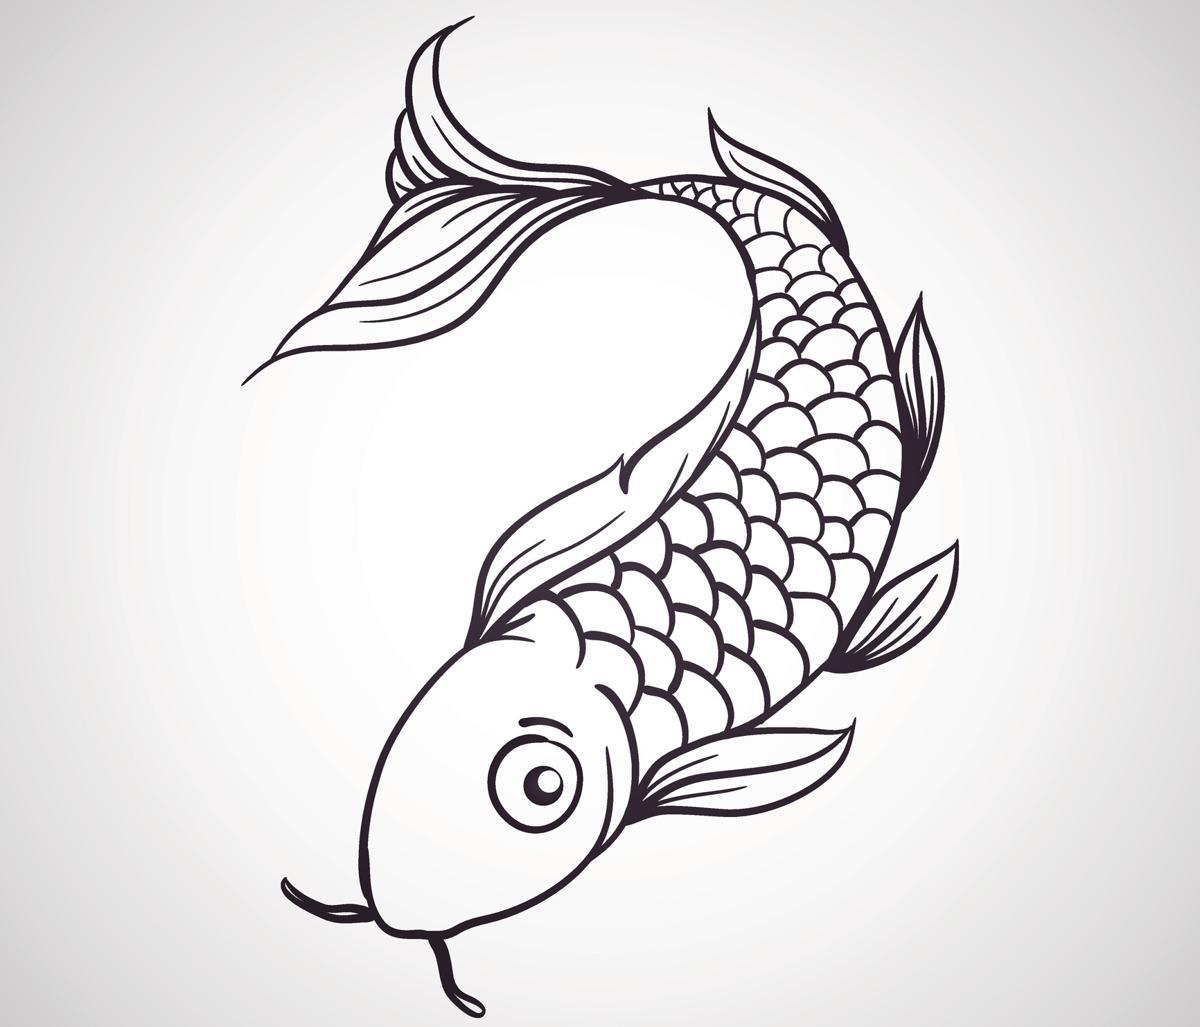 Koi tattoo meaning koi fish vector tattoo biocorpaavc